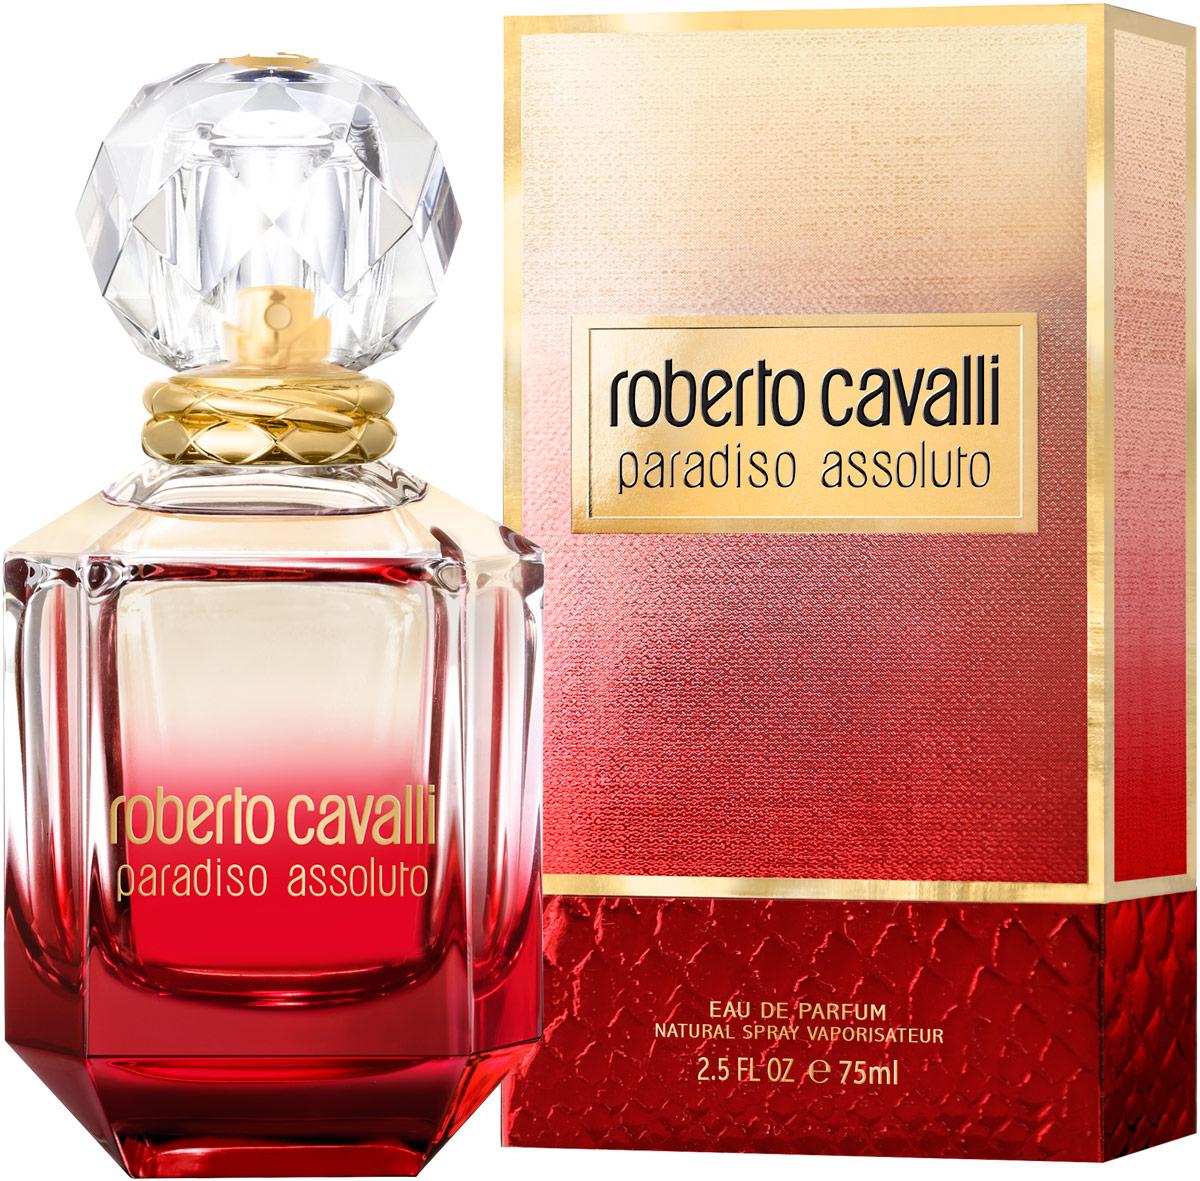 Roberto Cavalli Paradiso Assoluto женская Парфюмерная вода 75 мл